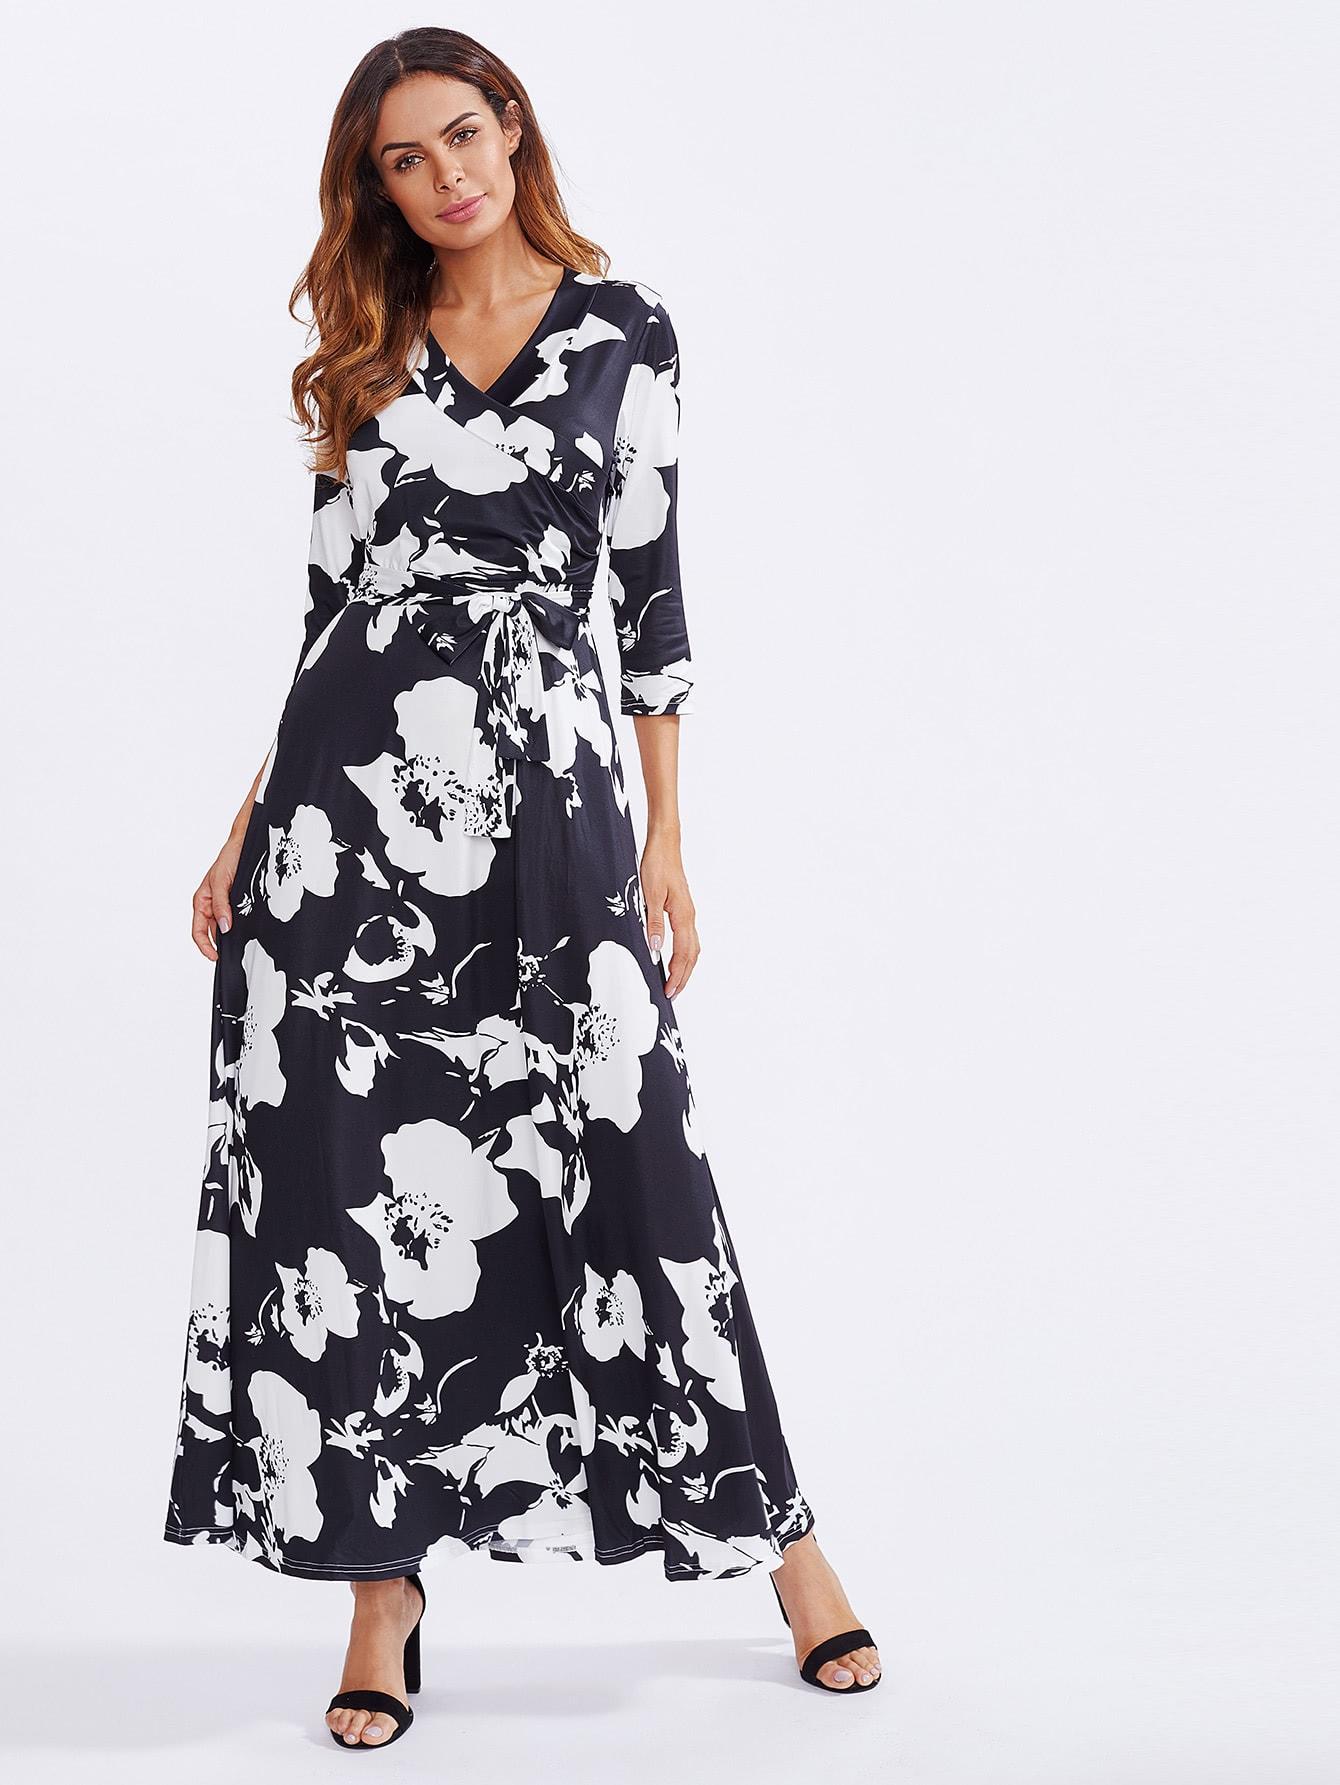 Flower Print Tie Waist Longline Dress flower print tie waist shirt dress